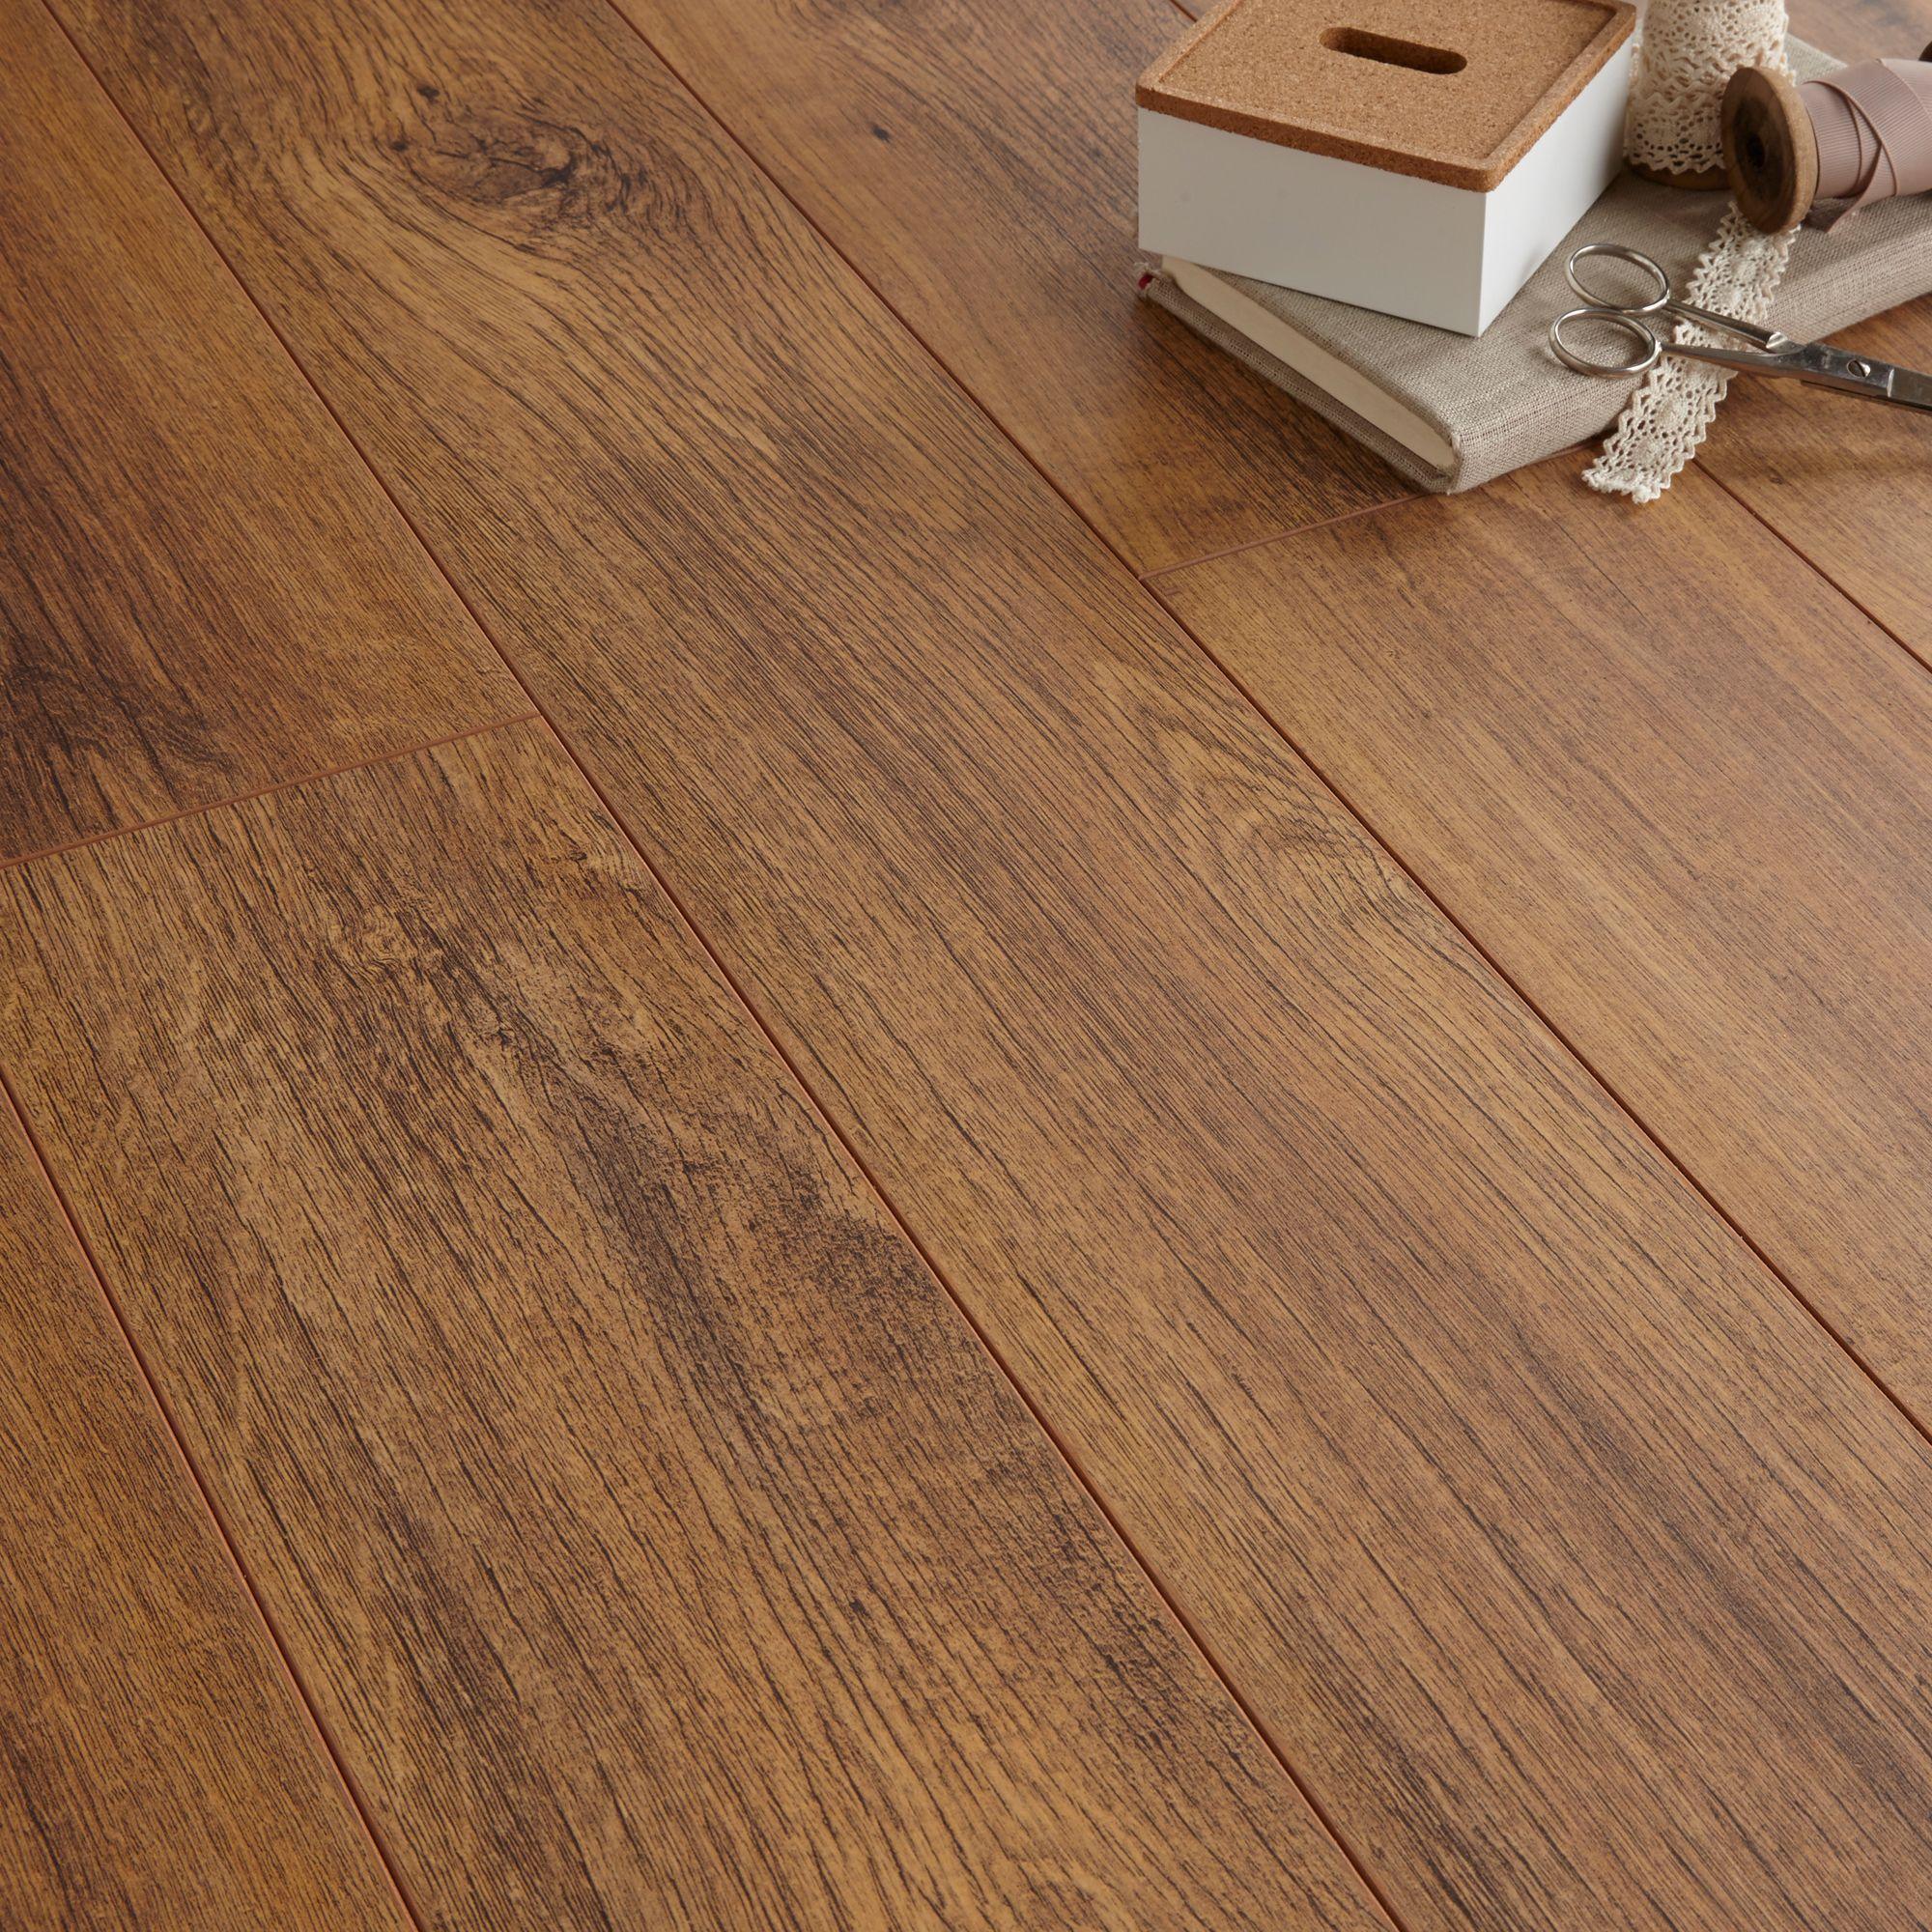 B Q Dolce High Gloss Walnut Effect Laminate Flooring